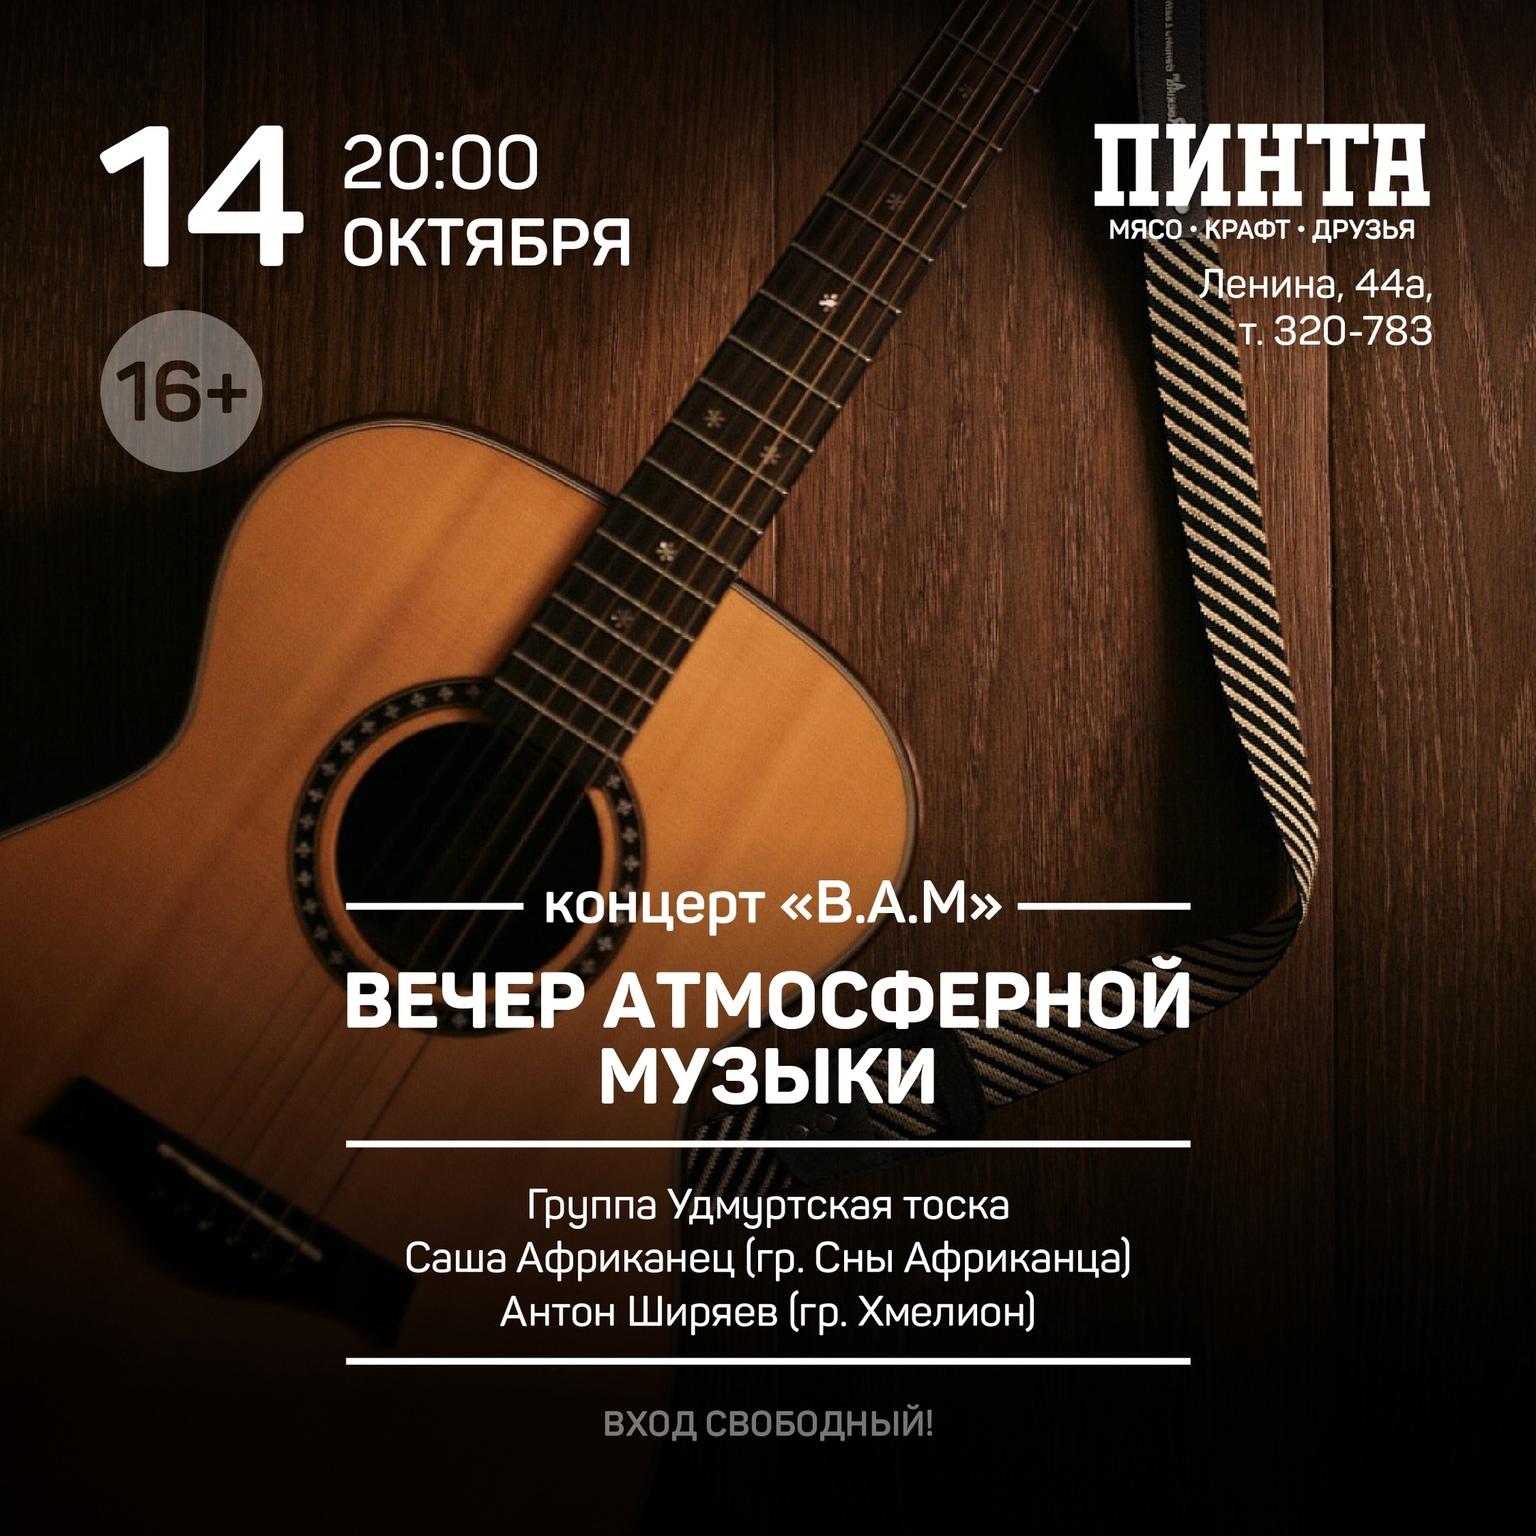 Афиша Ижевска — Вечер атмосферной музыки в «Пинте» на Ленина